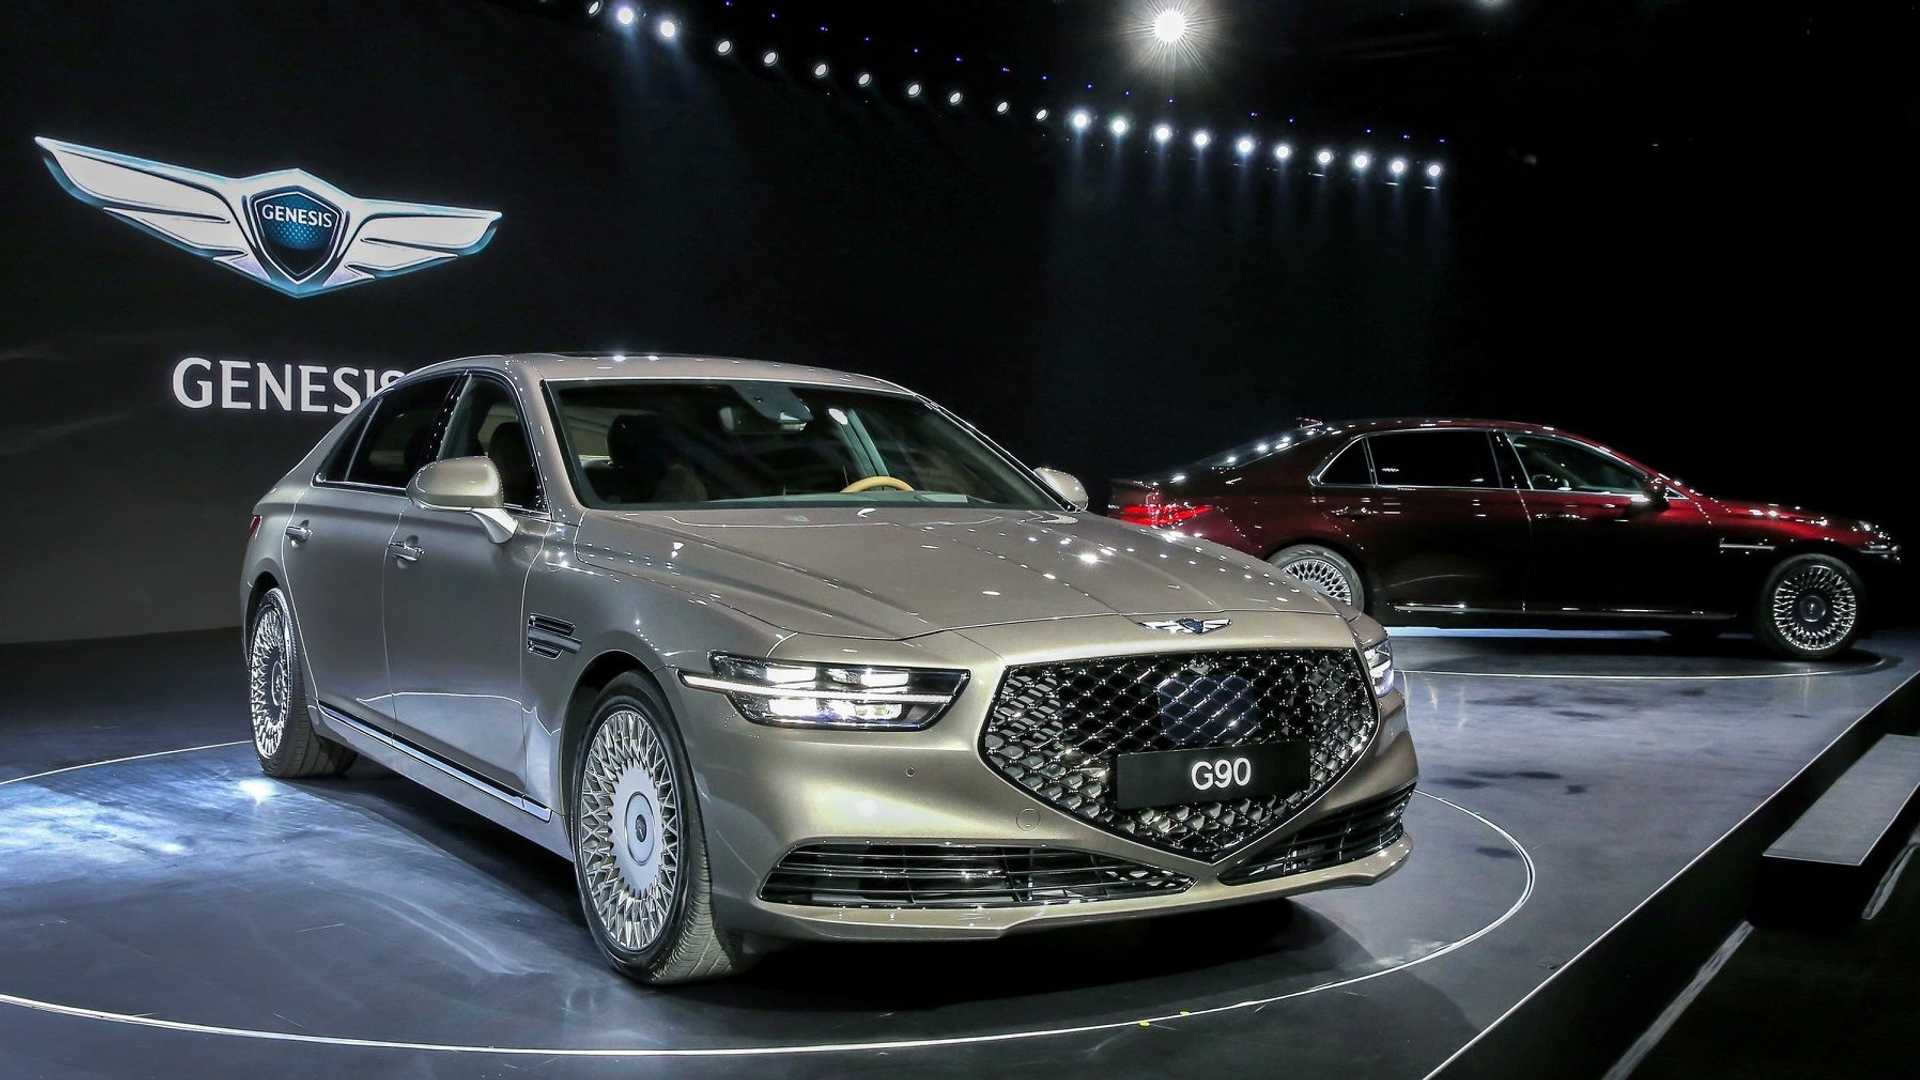 62 Gallery of Hyundai Genesis G90 2020 Release with Hyundai Genesis G90 2020